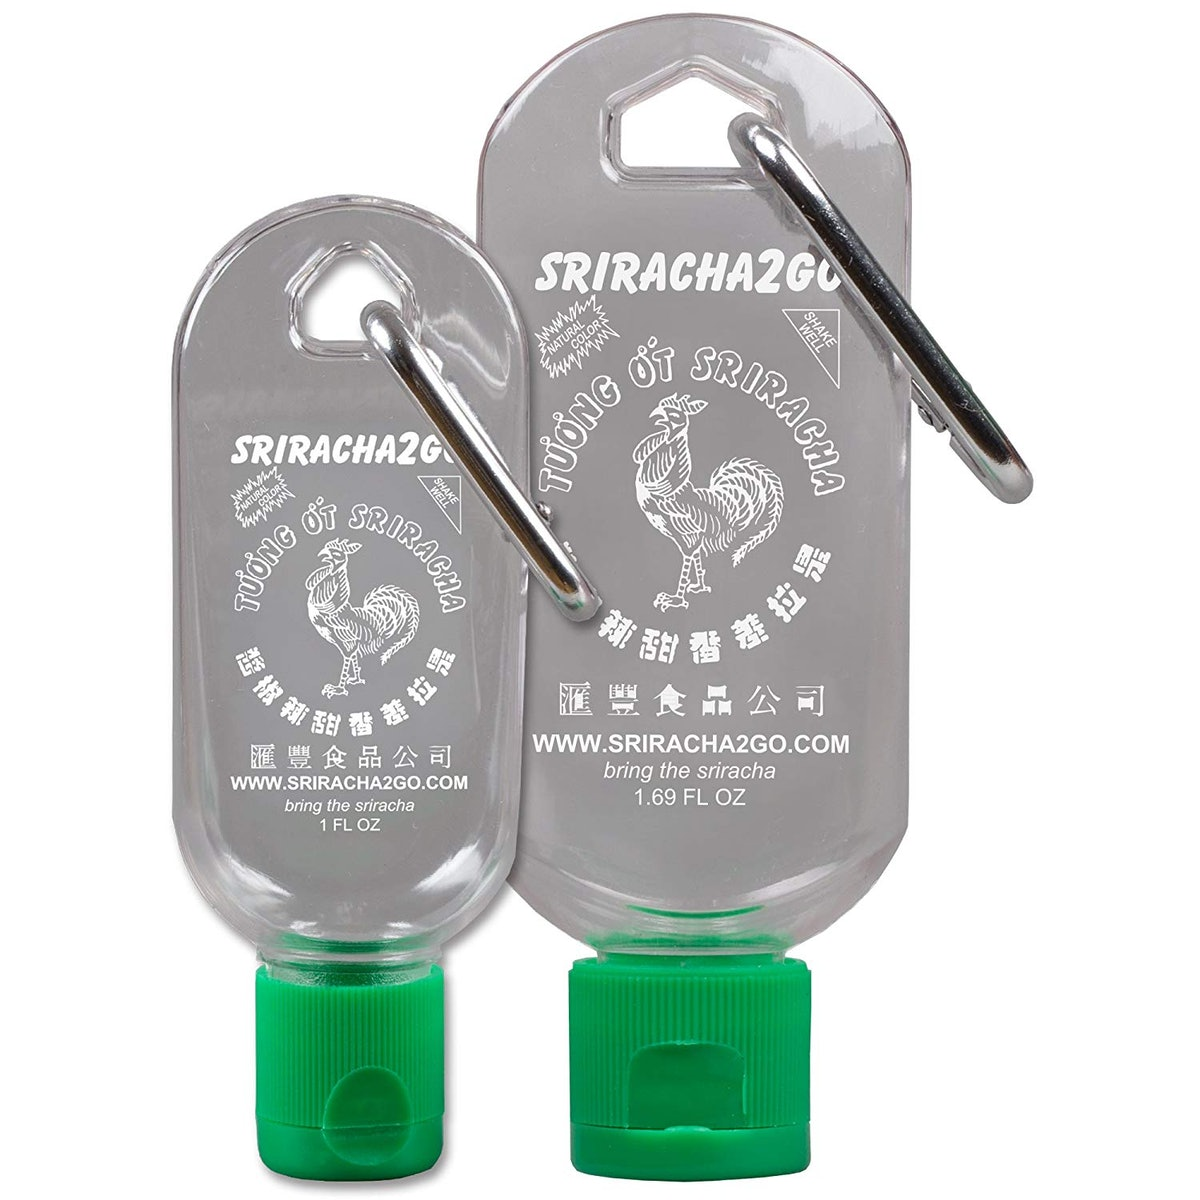 Sriracha2Go Keychain (2 Pack)